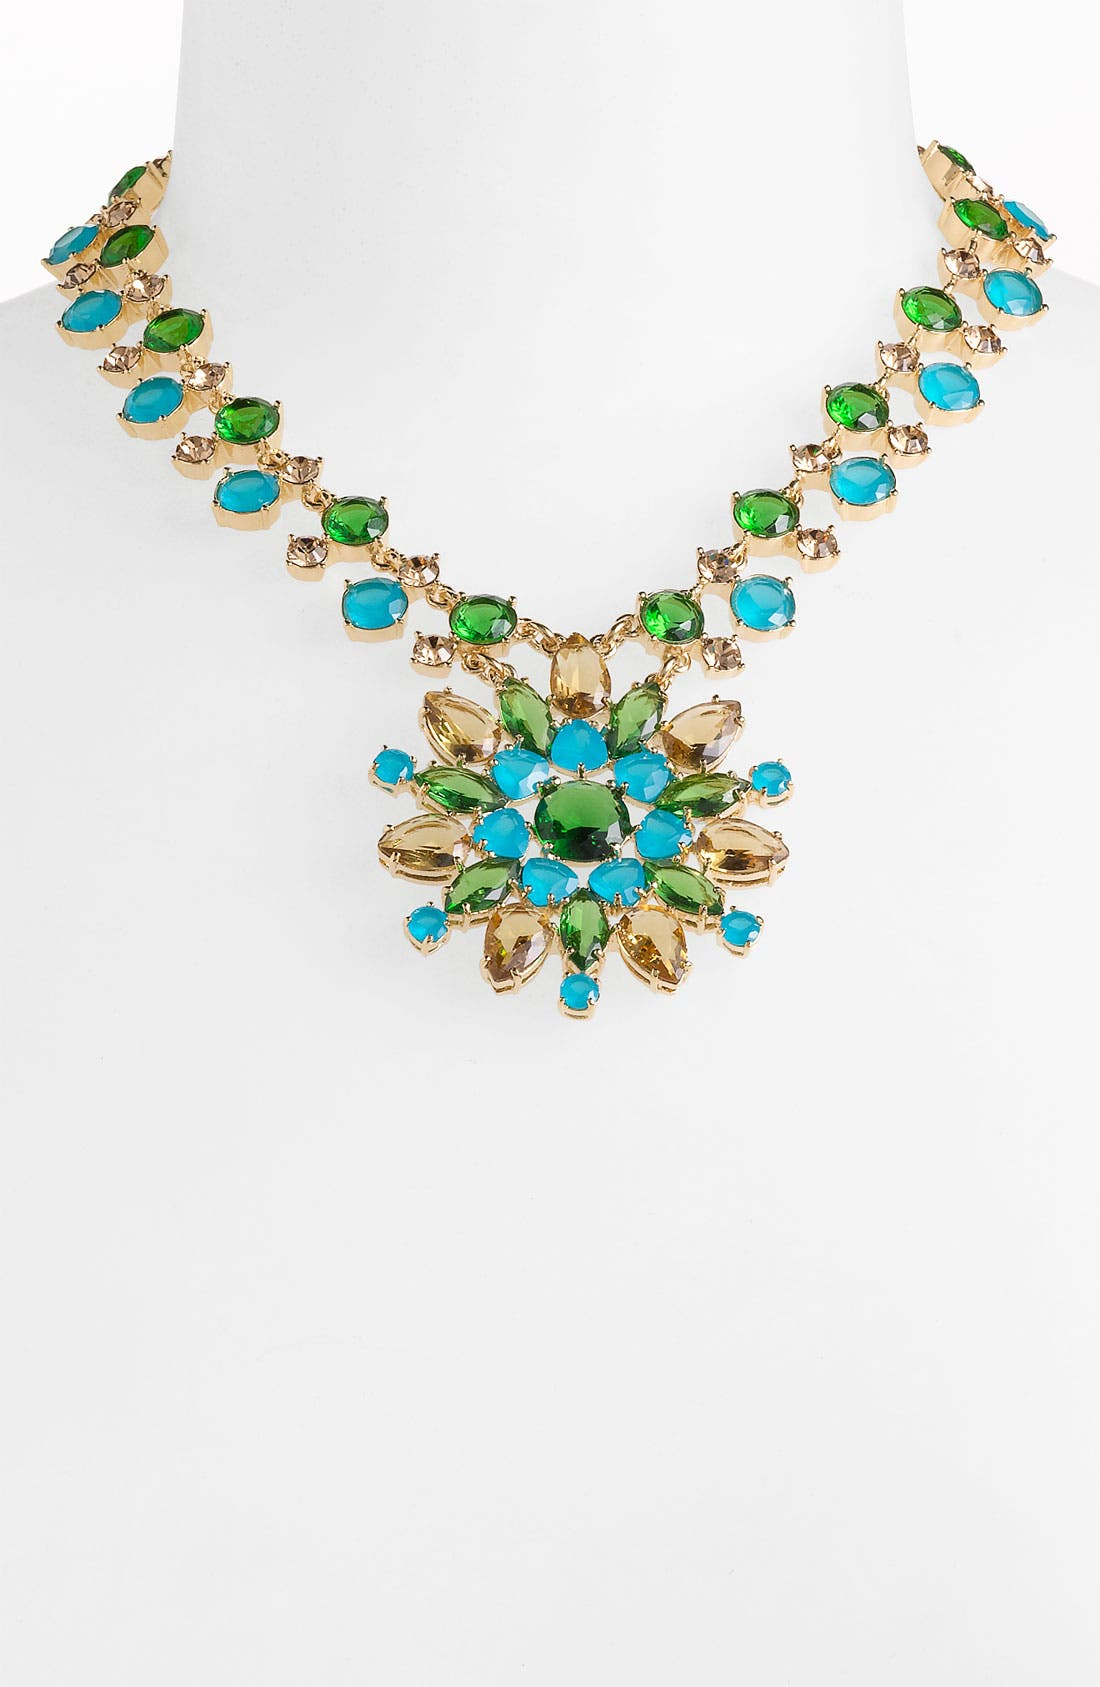 KATE SPADE NEW YORK, 'solarium' pendant necklace, Main thumbnail 1, color, 440